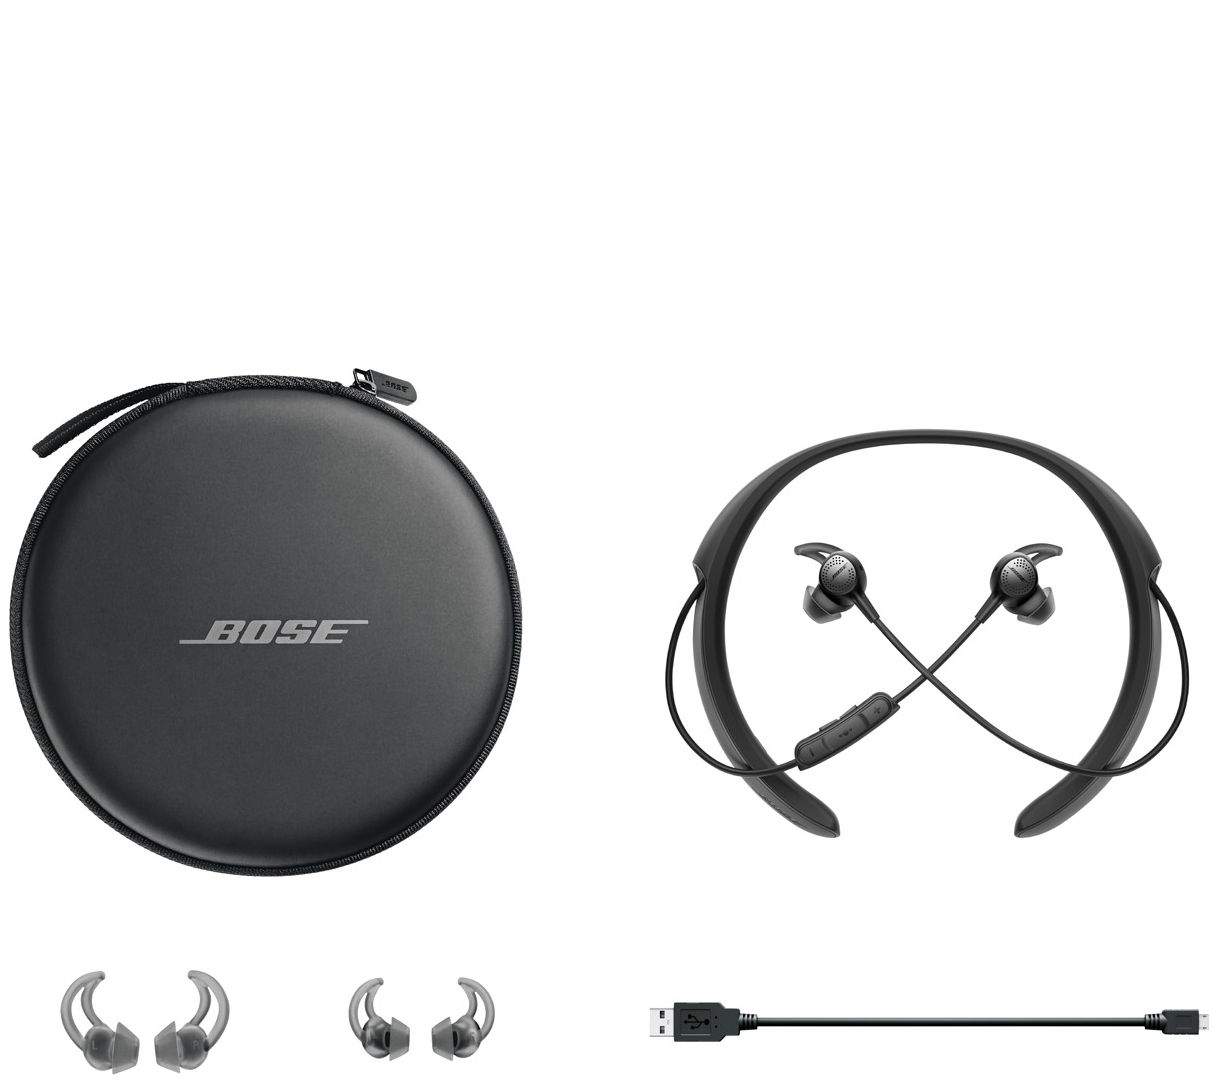 bose noise cancelling headphones case. bose noise cancelling headphones case